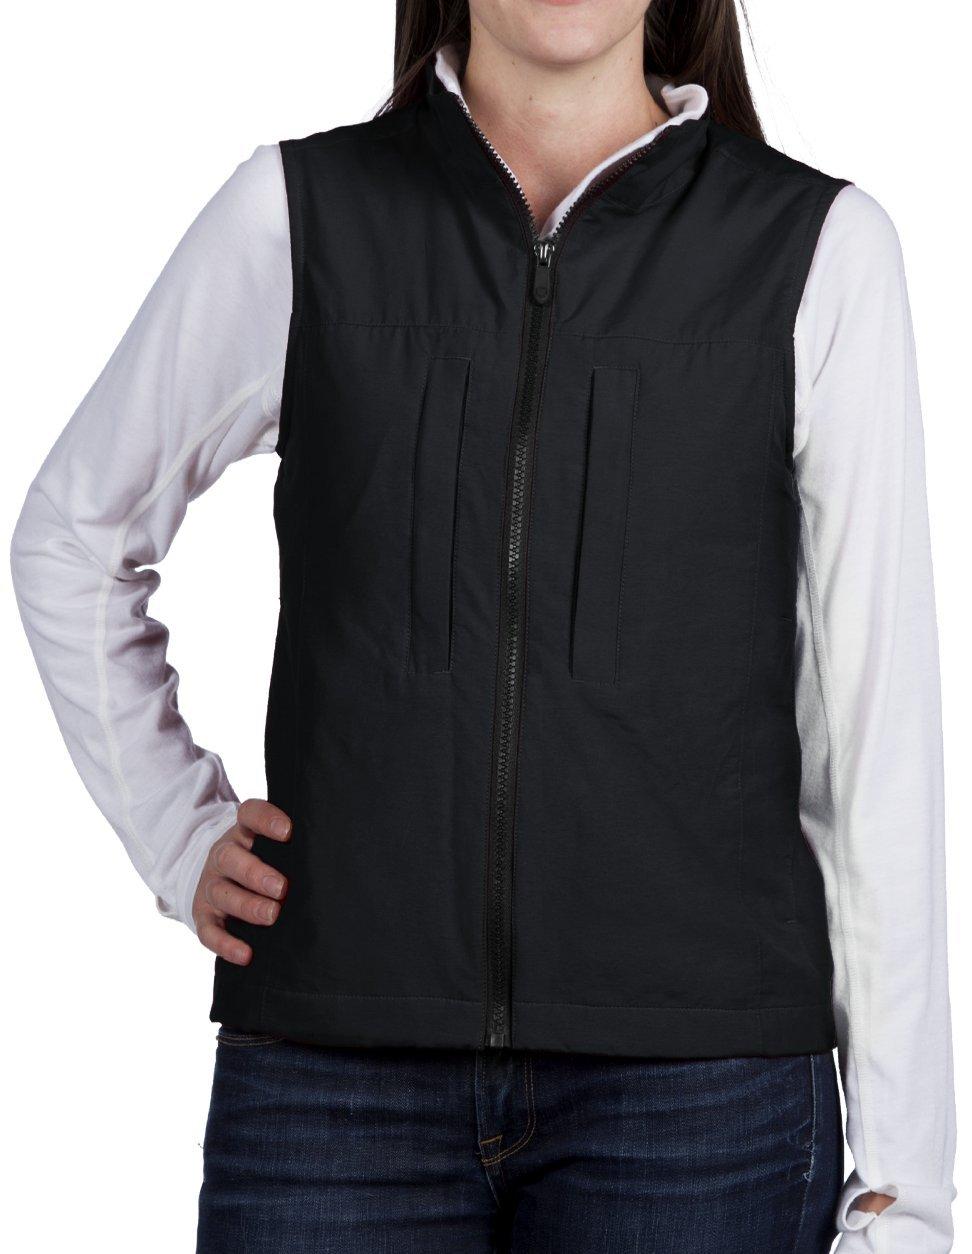 SCOTTeVEST NBT Vest for Women - 8 Pockets - BLK M